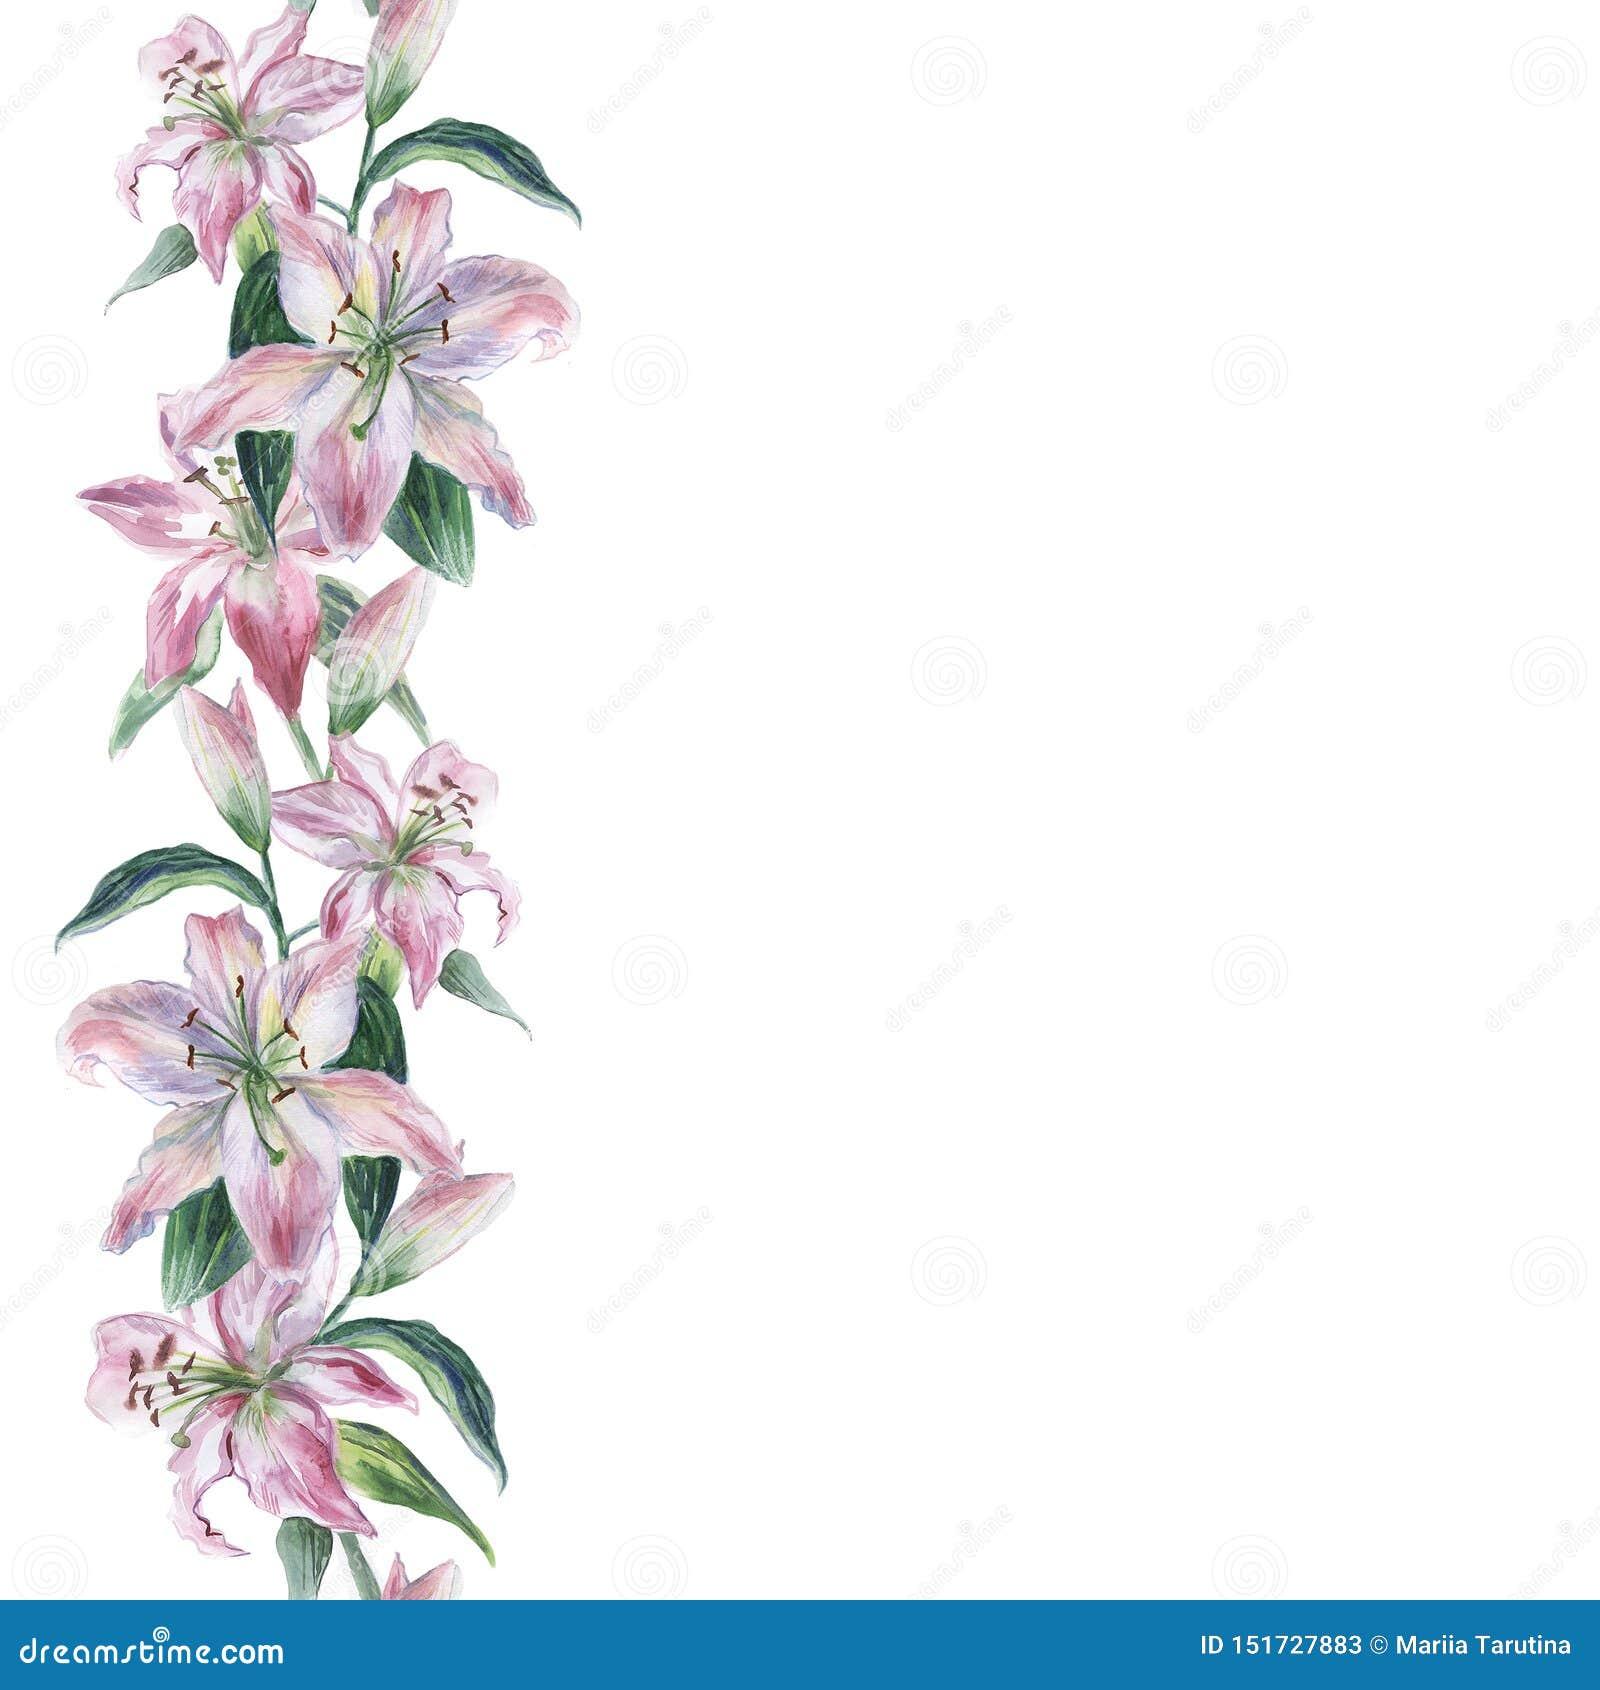 Waterverf naadloos patroon met witte en roze waterverf lilys op een witte achtergrond